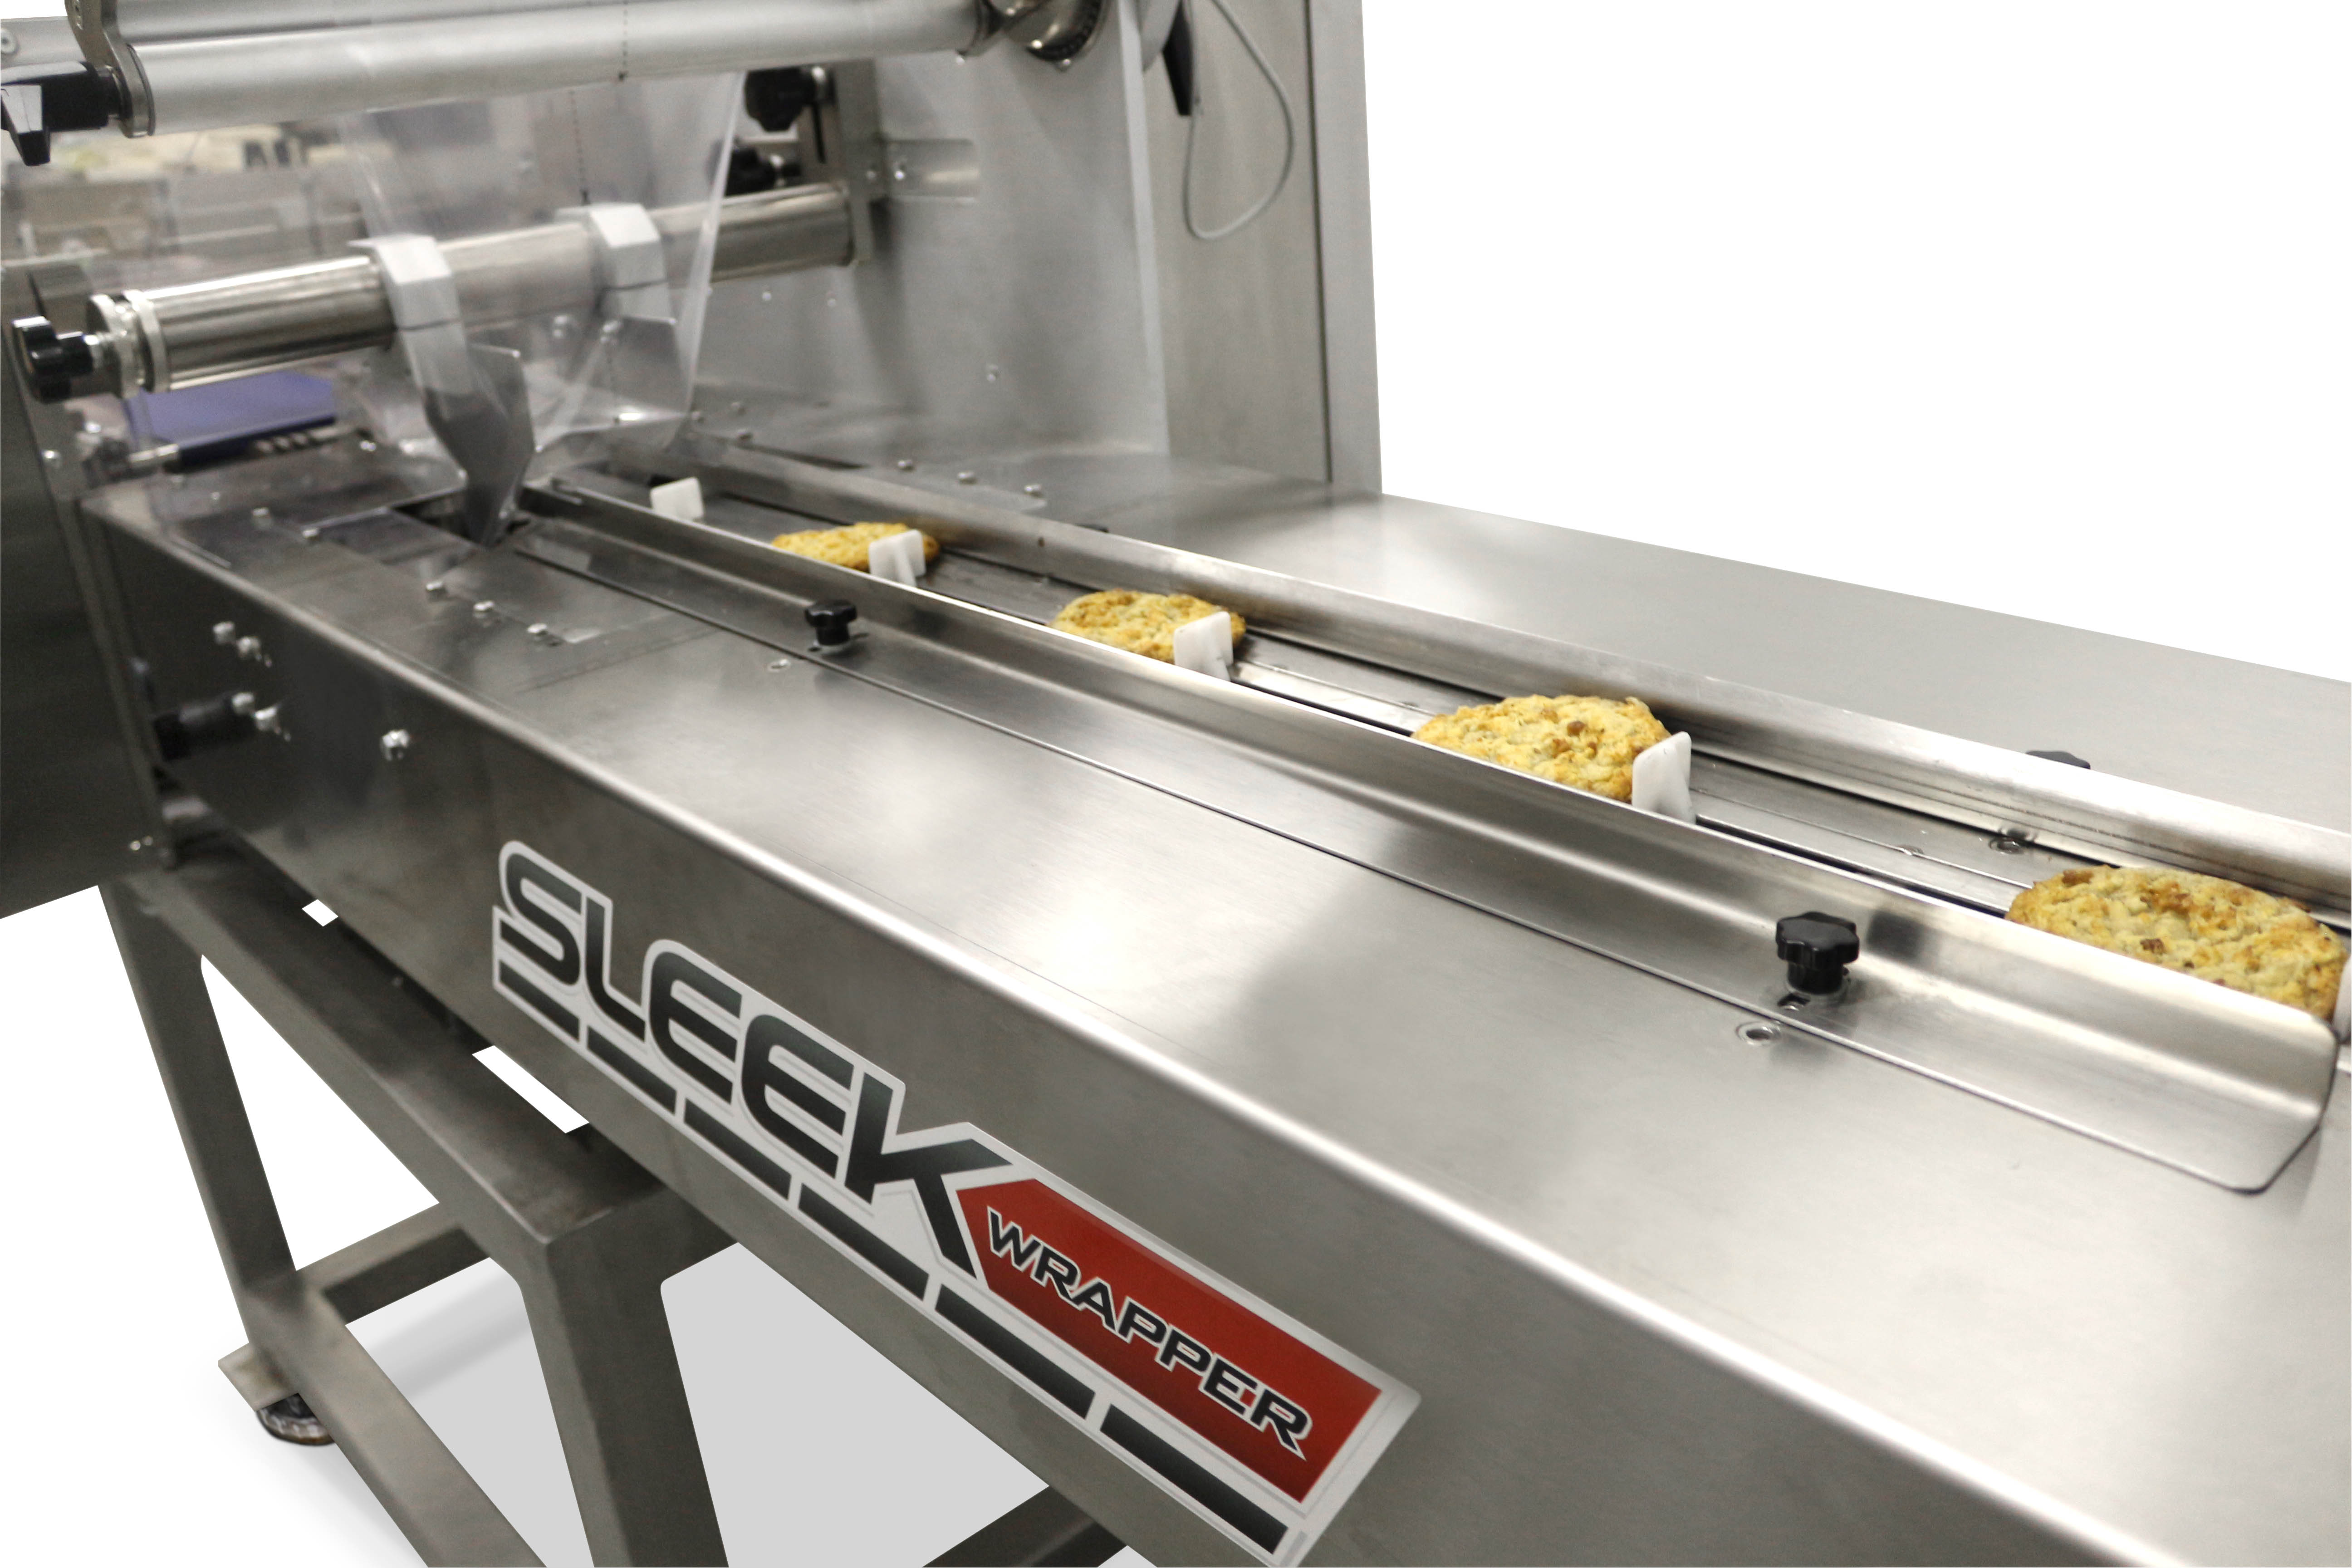 SleekWrapper horizontal flow wrapping machine